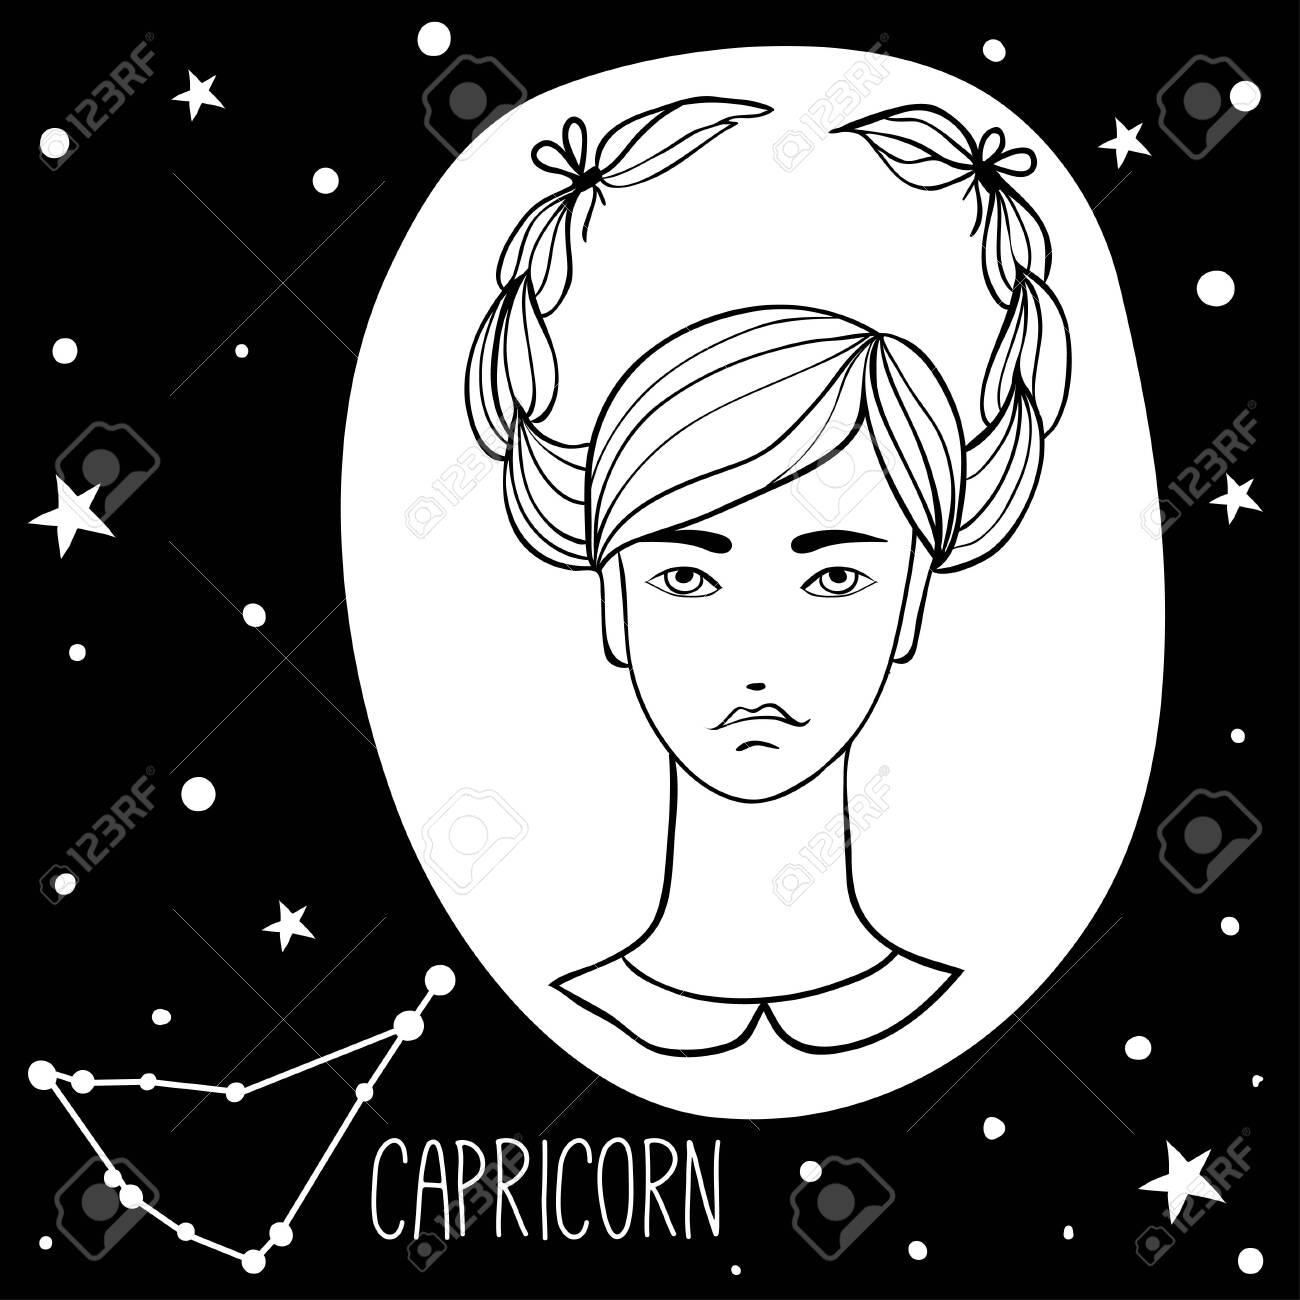 Capricorn Woman Image Art Sketch